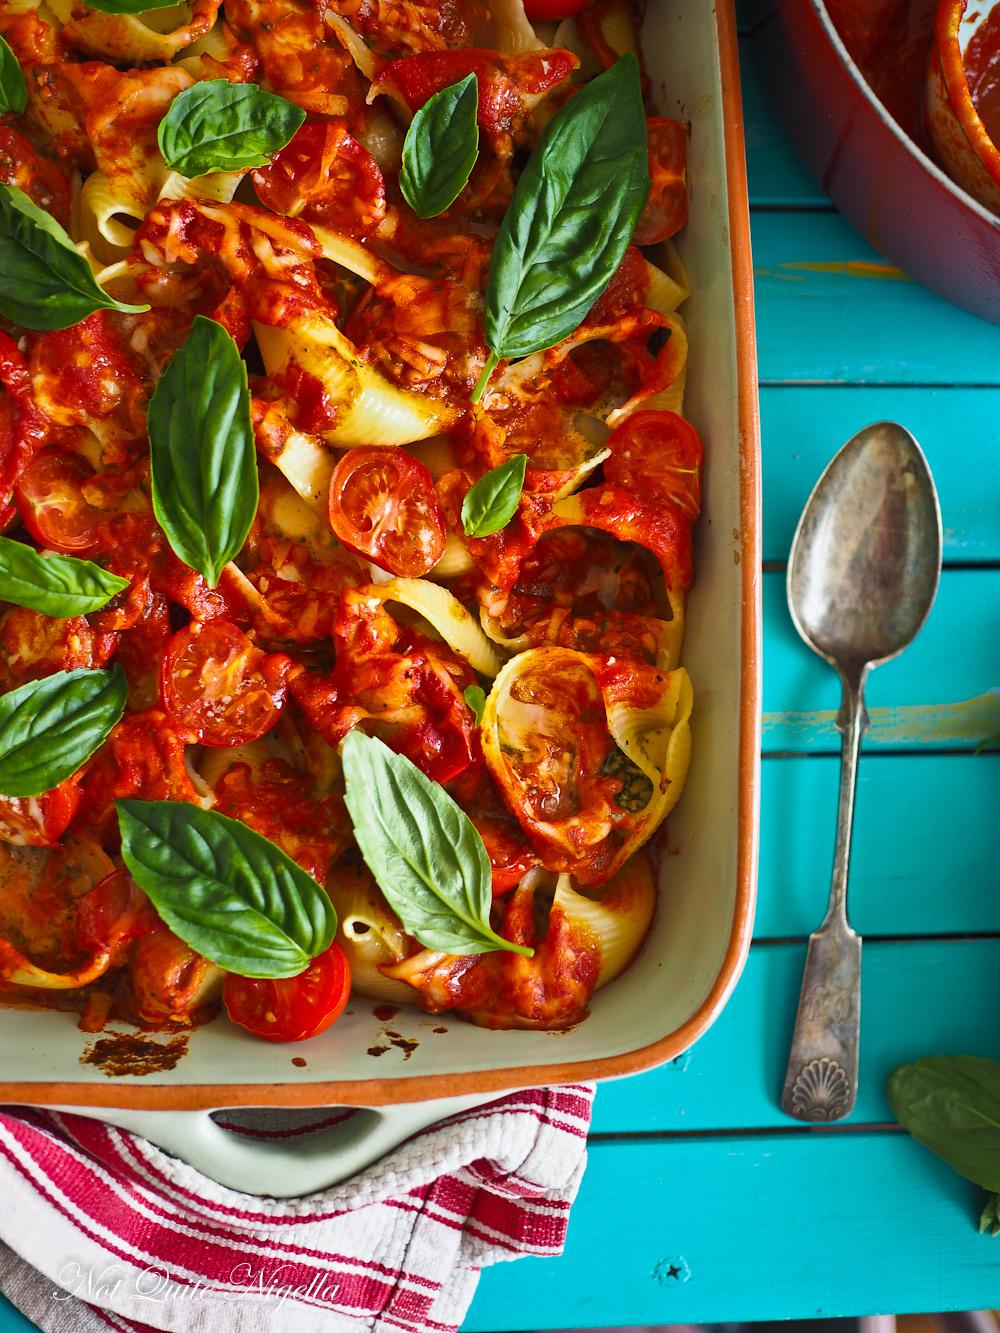 Tomato Basil Bocconcini Pasta Bake Vegetarian